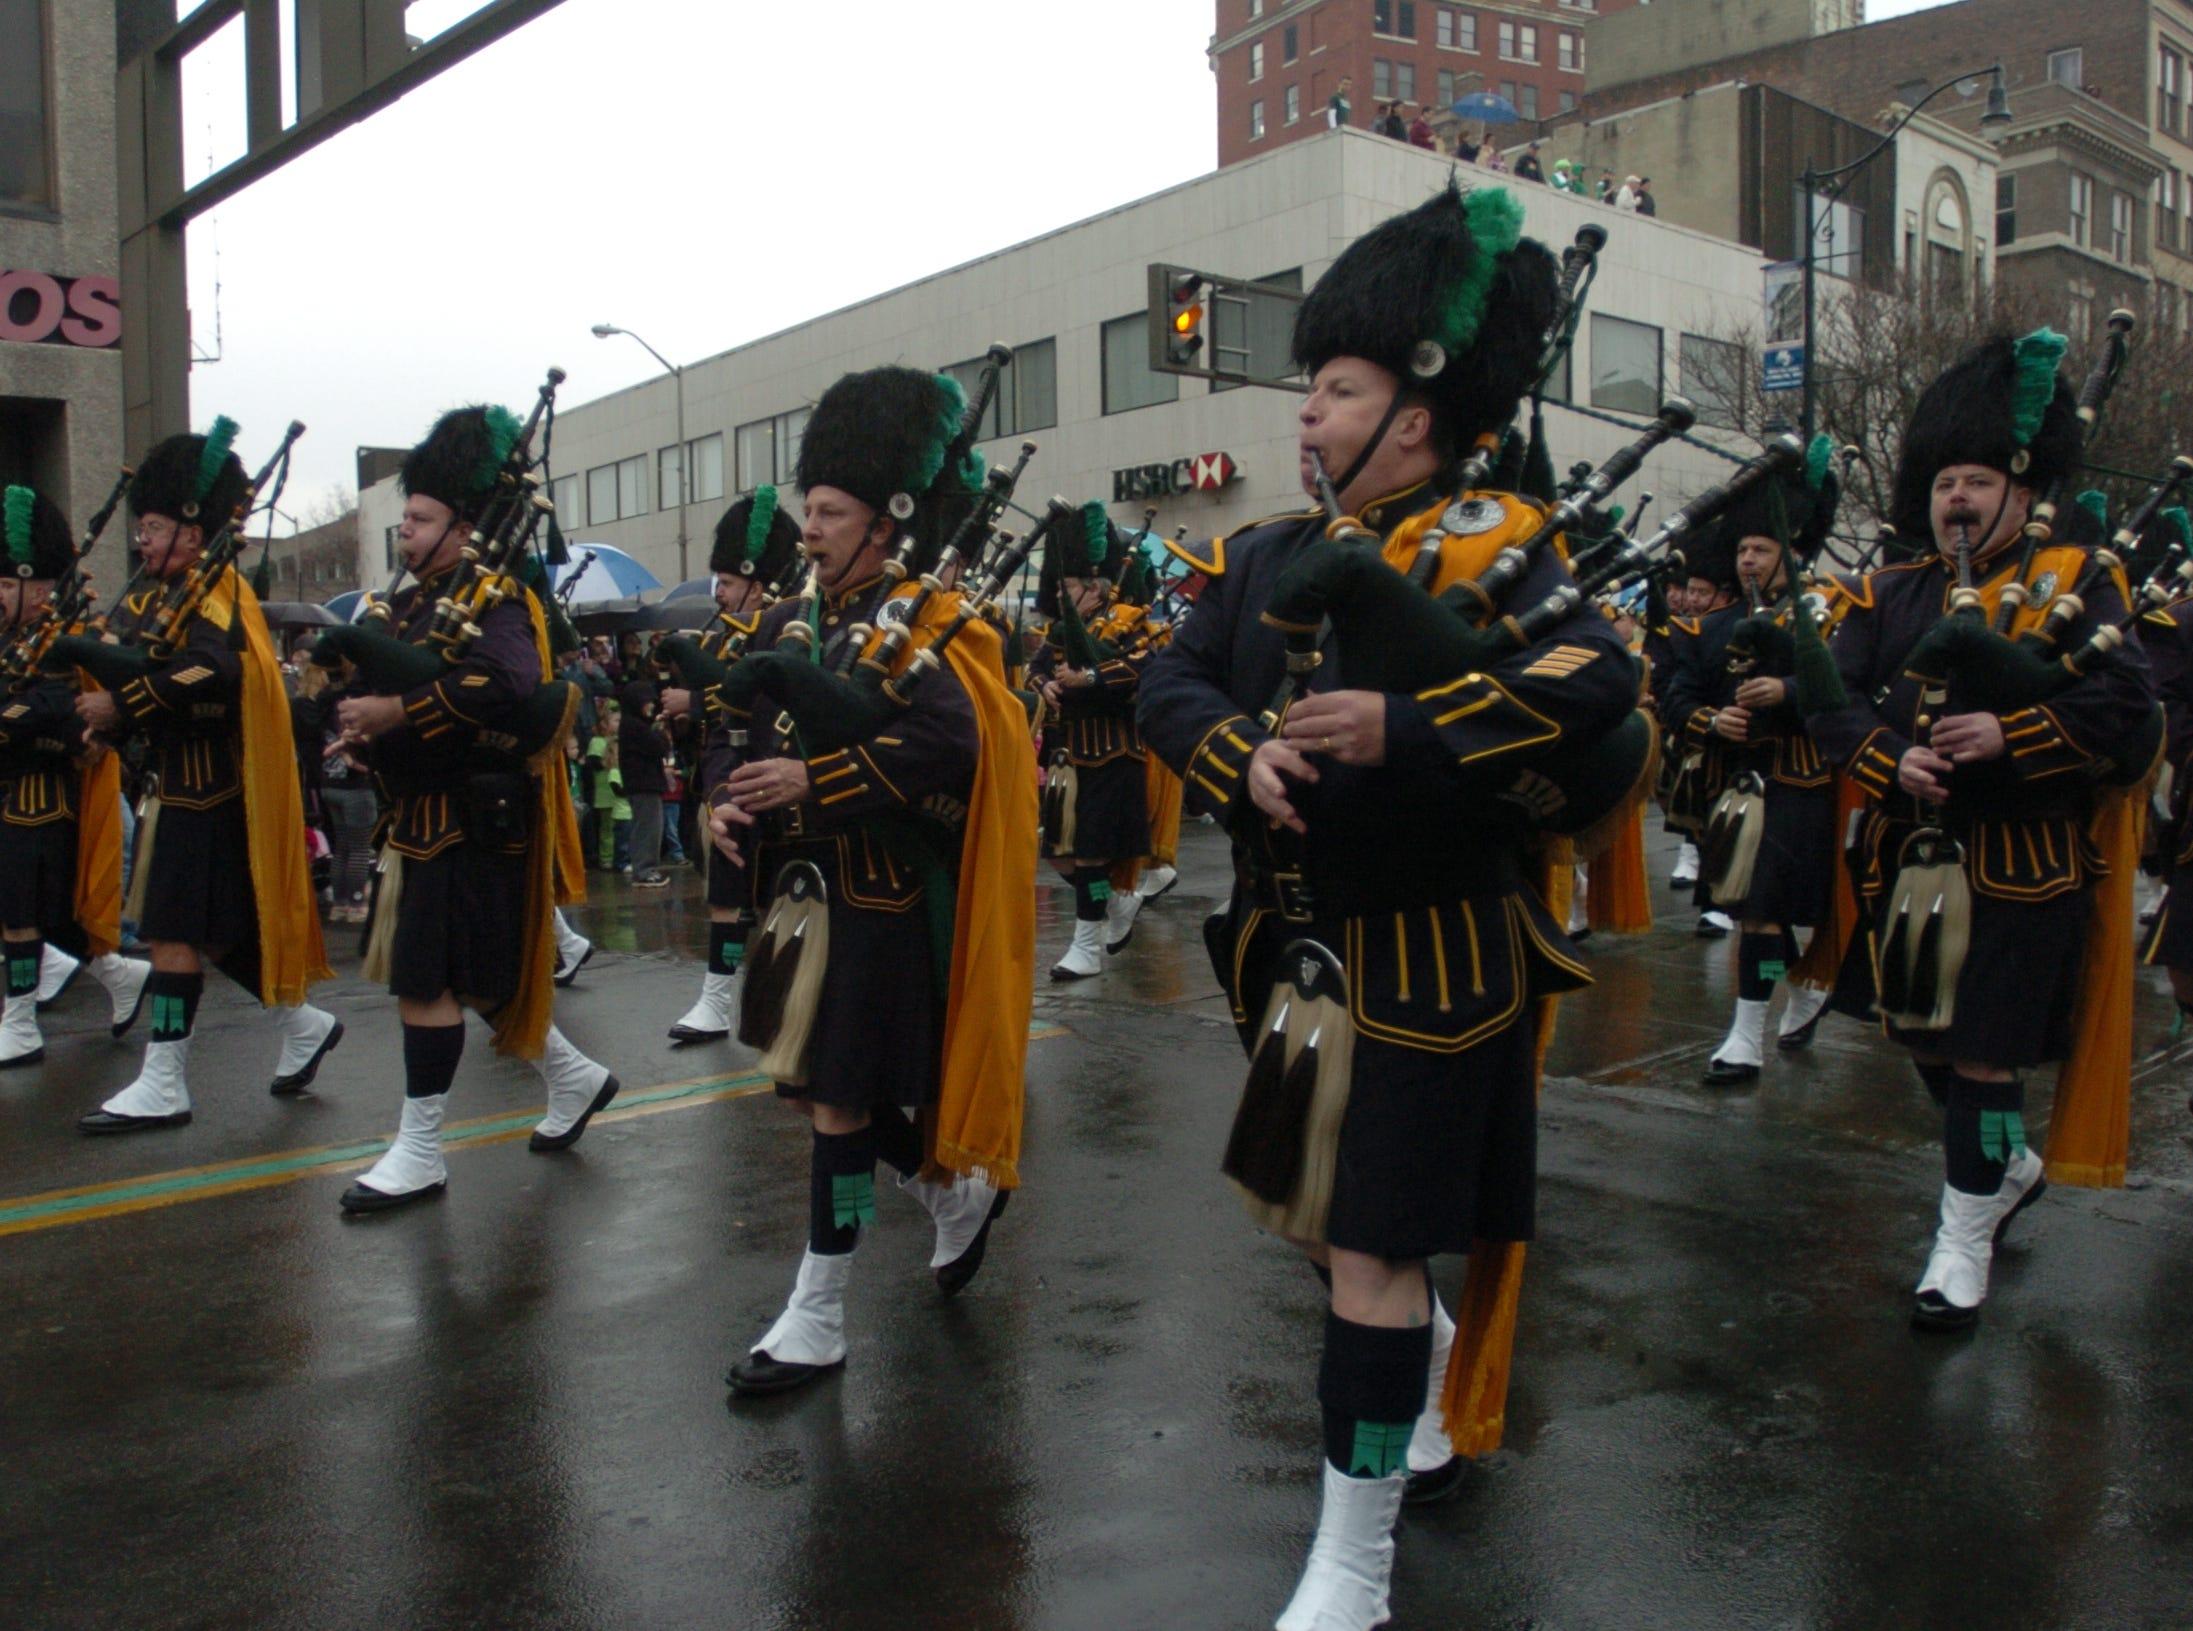 2009: St. Patrick's Day Parade